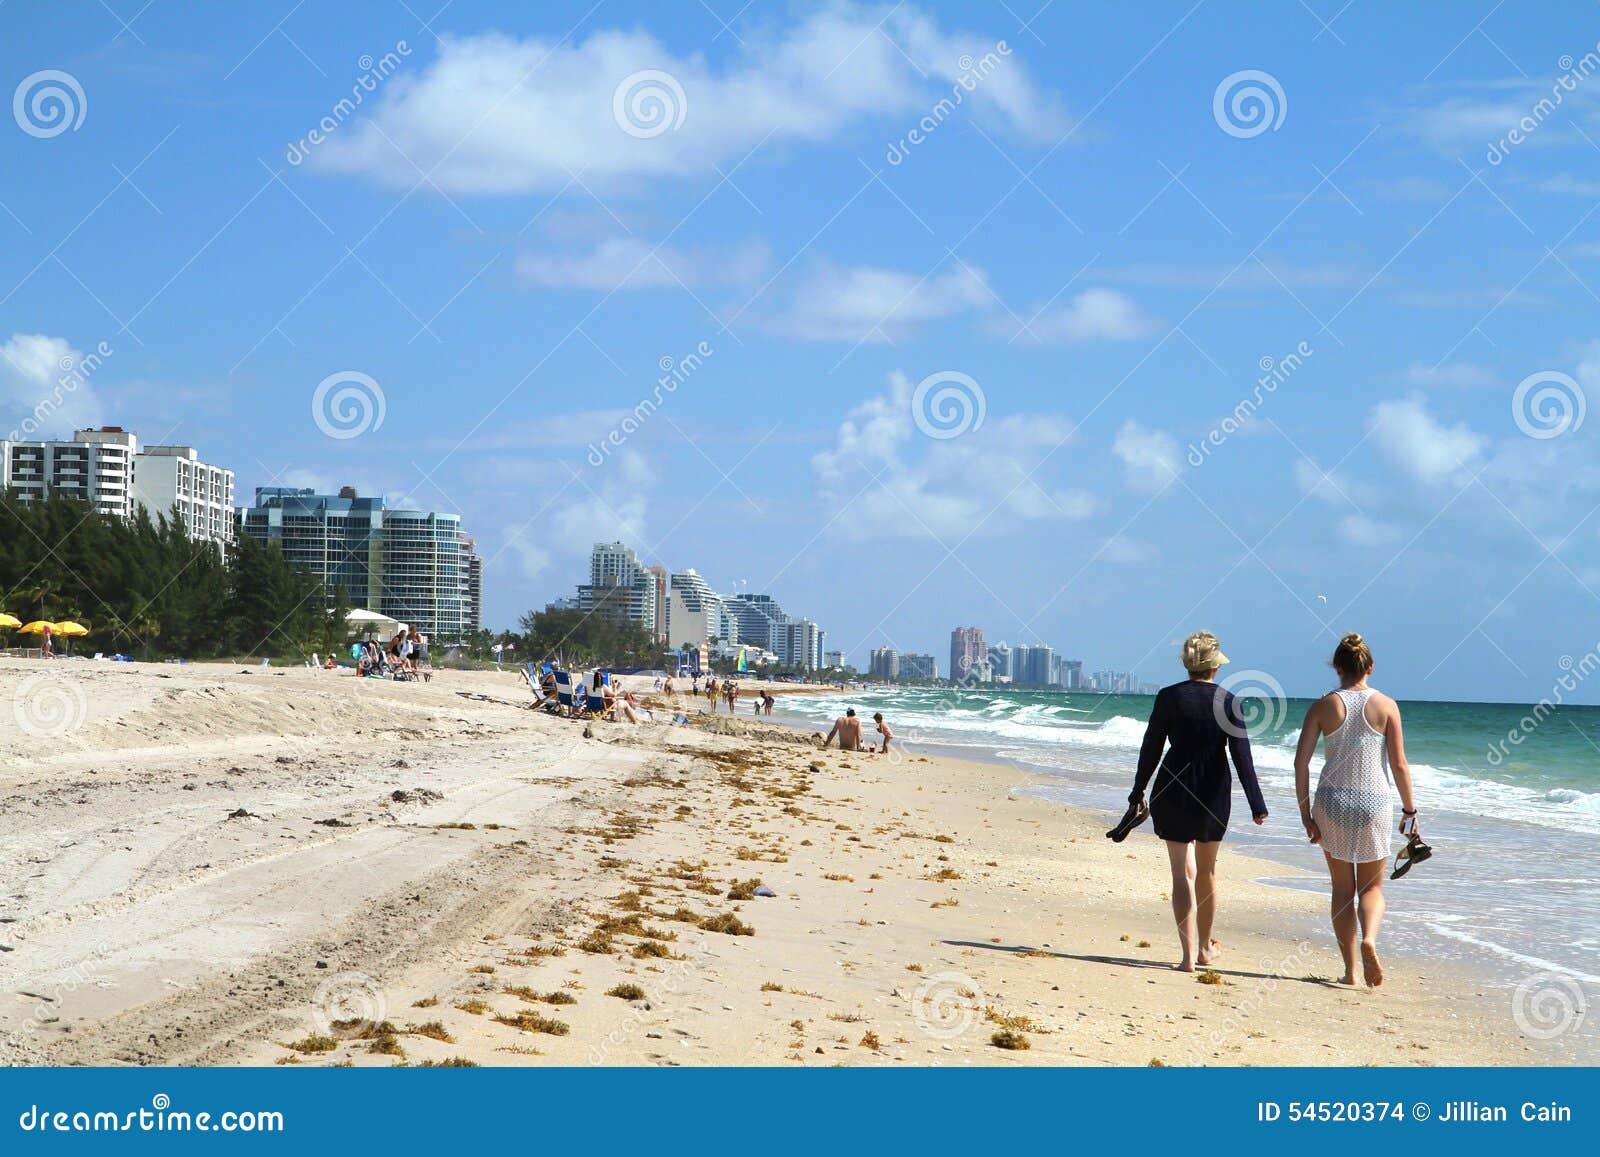 Fort Lauderdale Beach Restoration